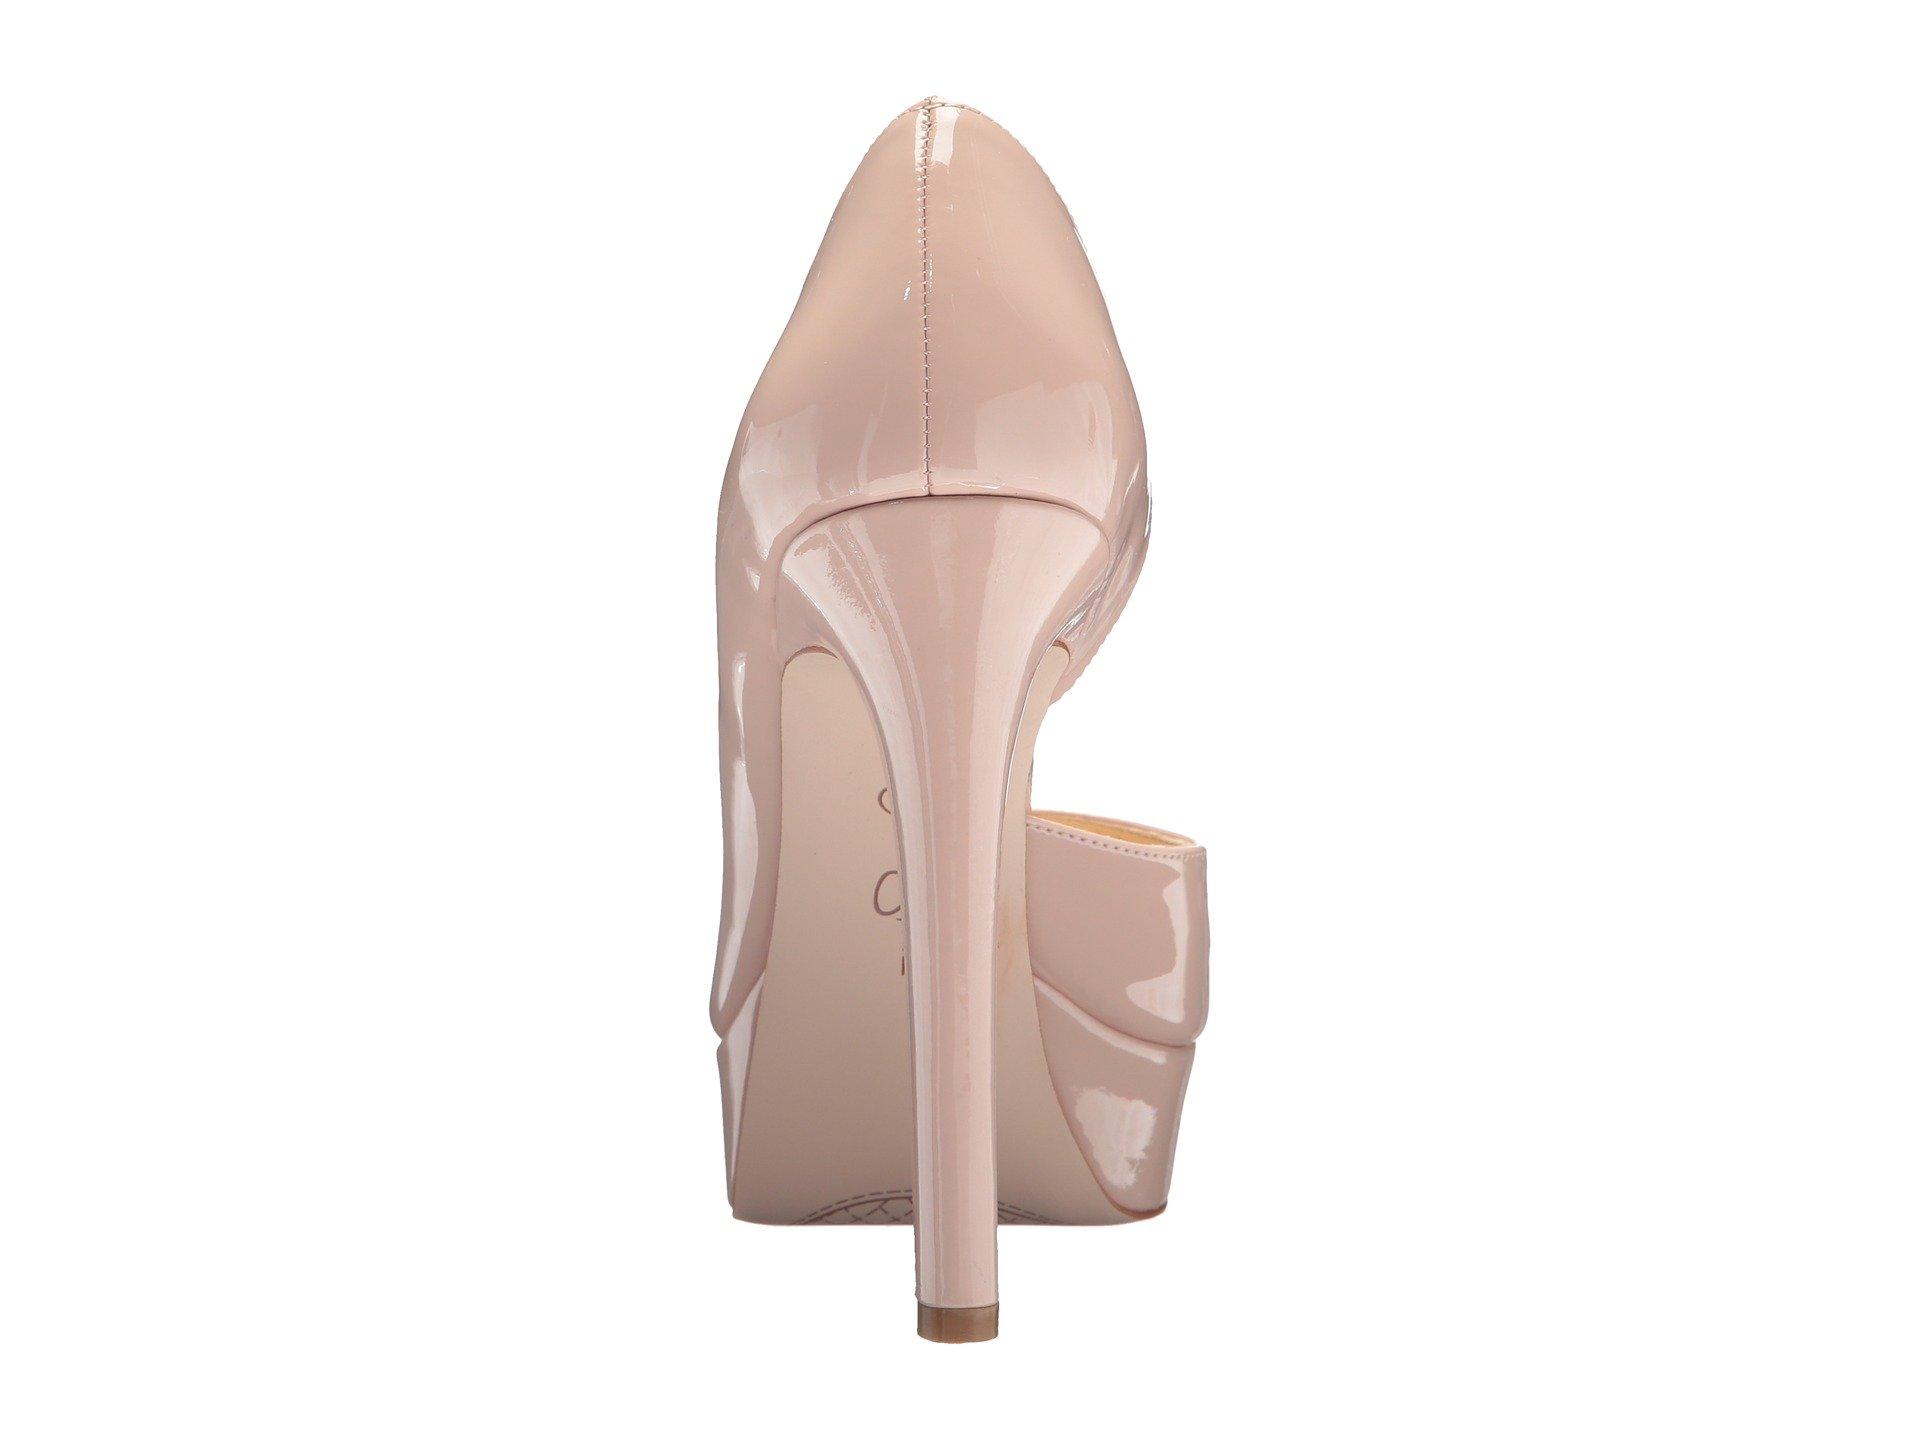 Jessica-Simpson-Martella-d-039-Orsay-Peep-Toe-Platform-Pumps thumbnail 5